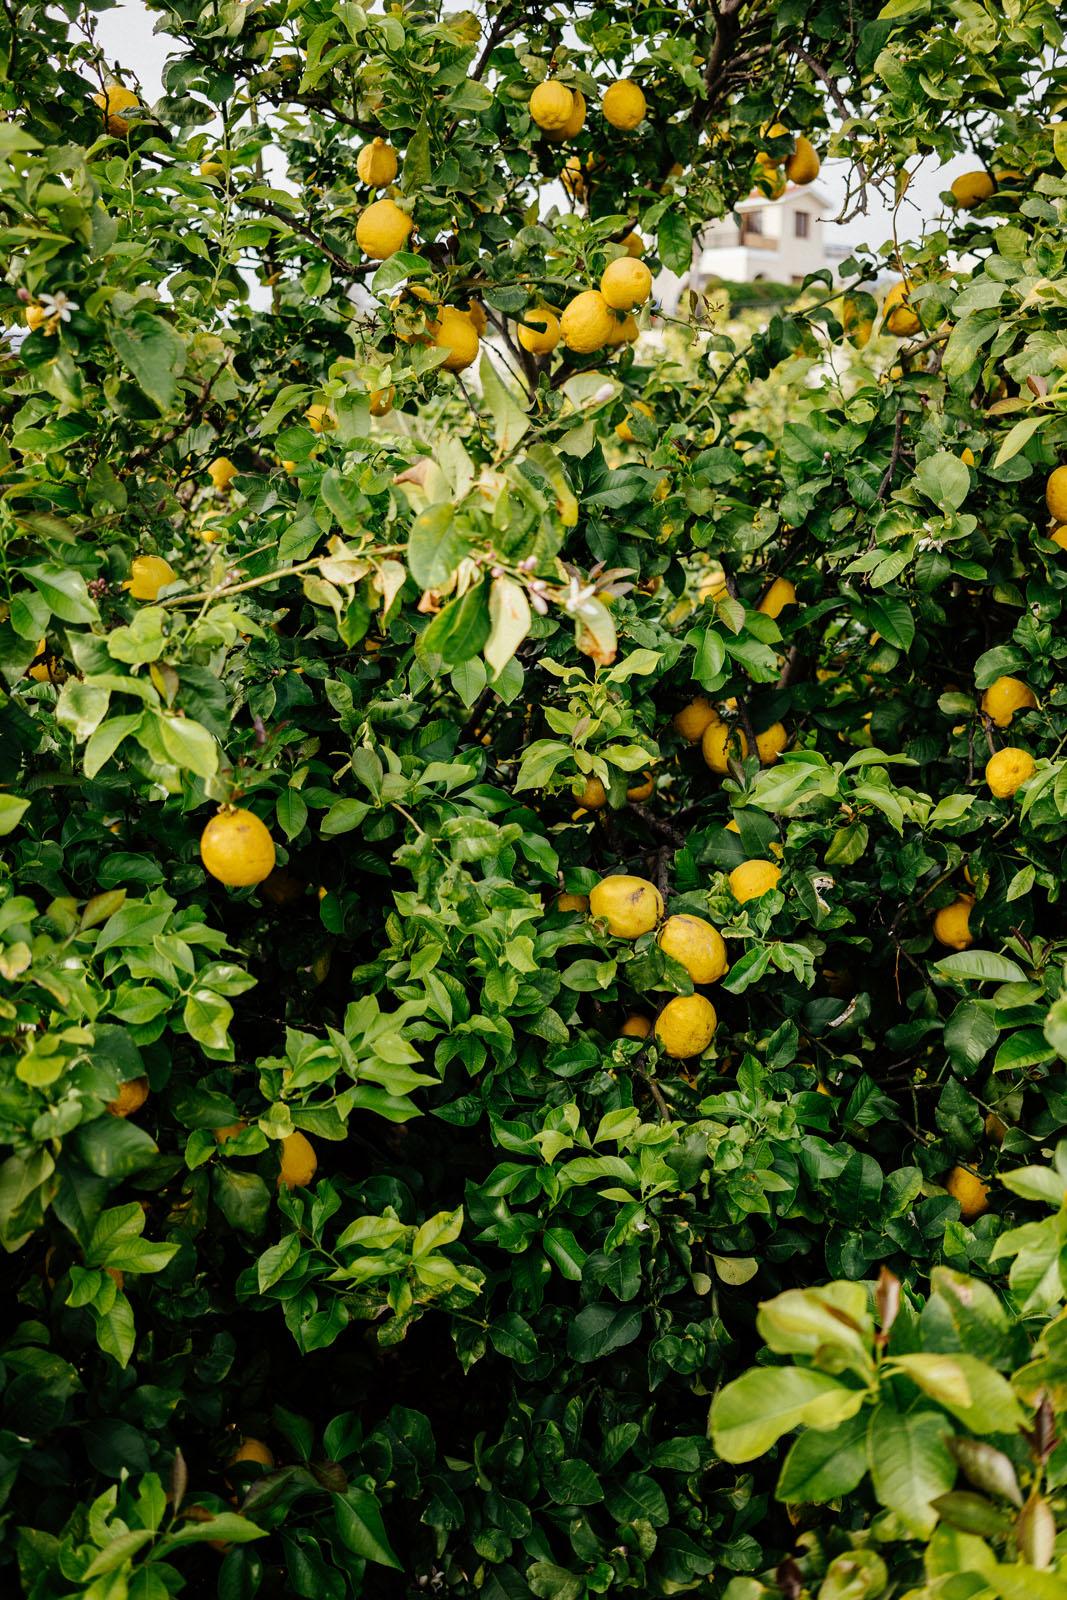 Cytryny cypryjskie